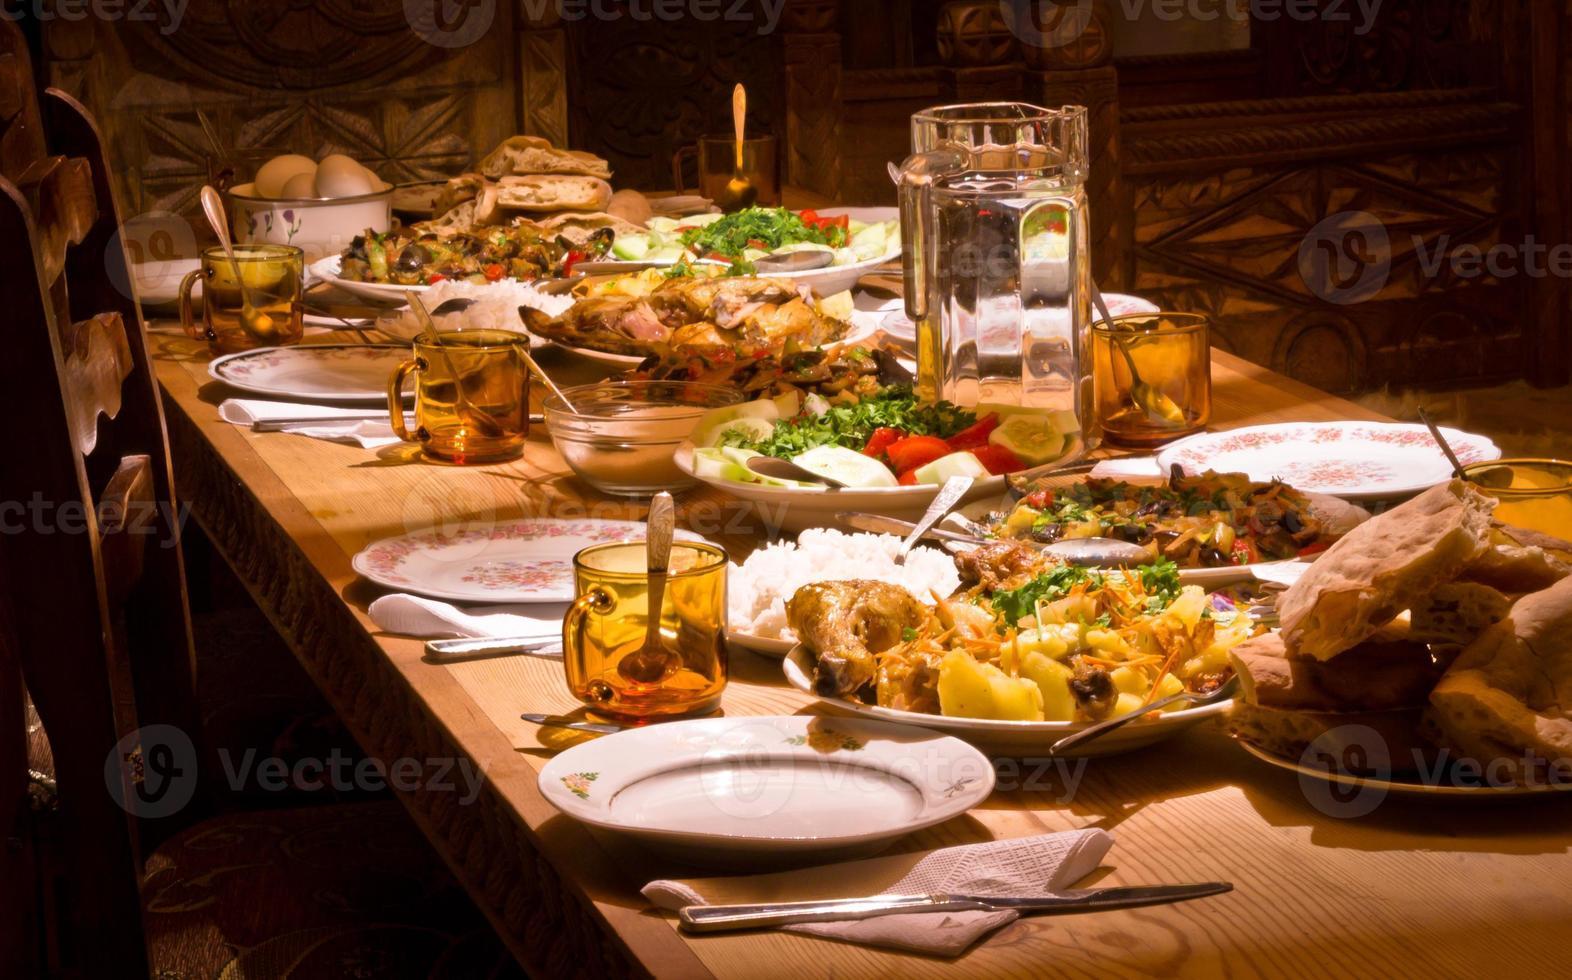 comida georgiana tradicional foto